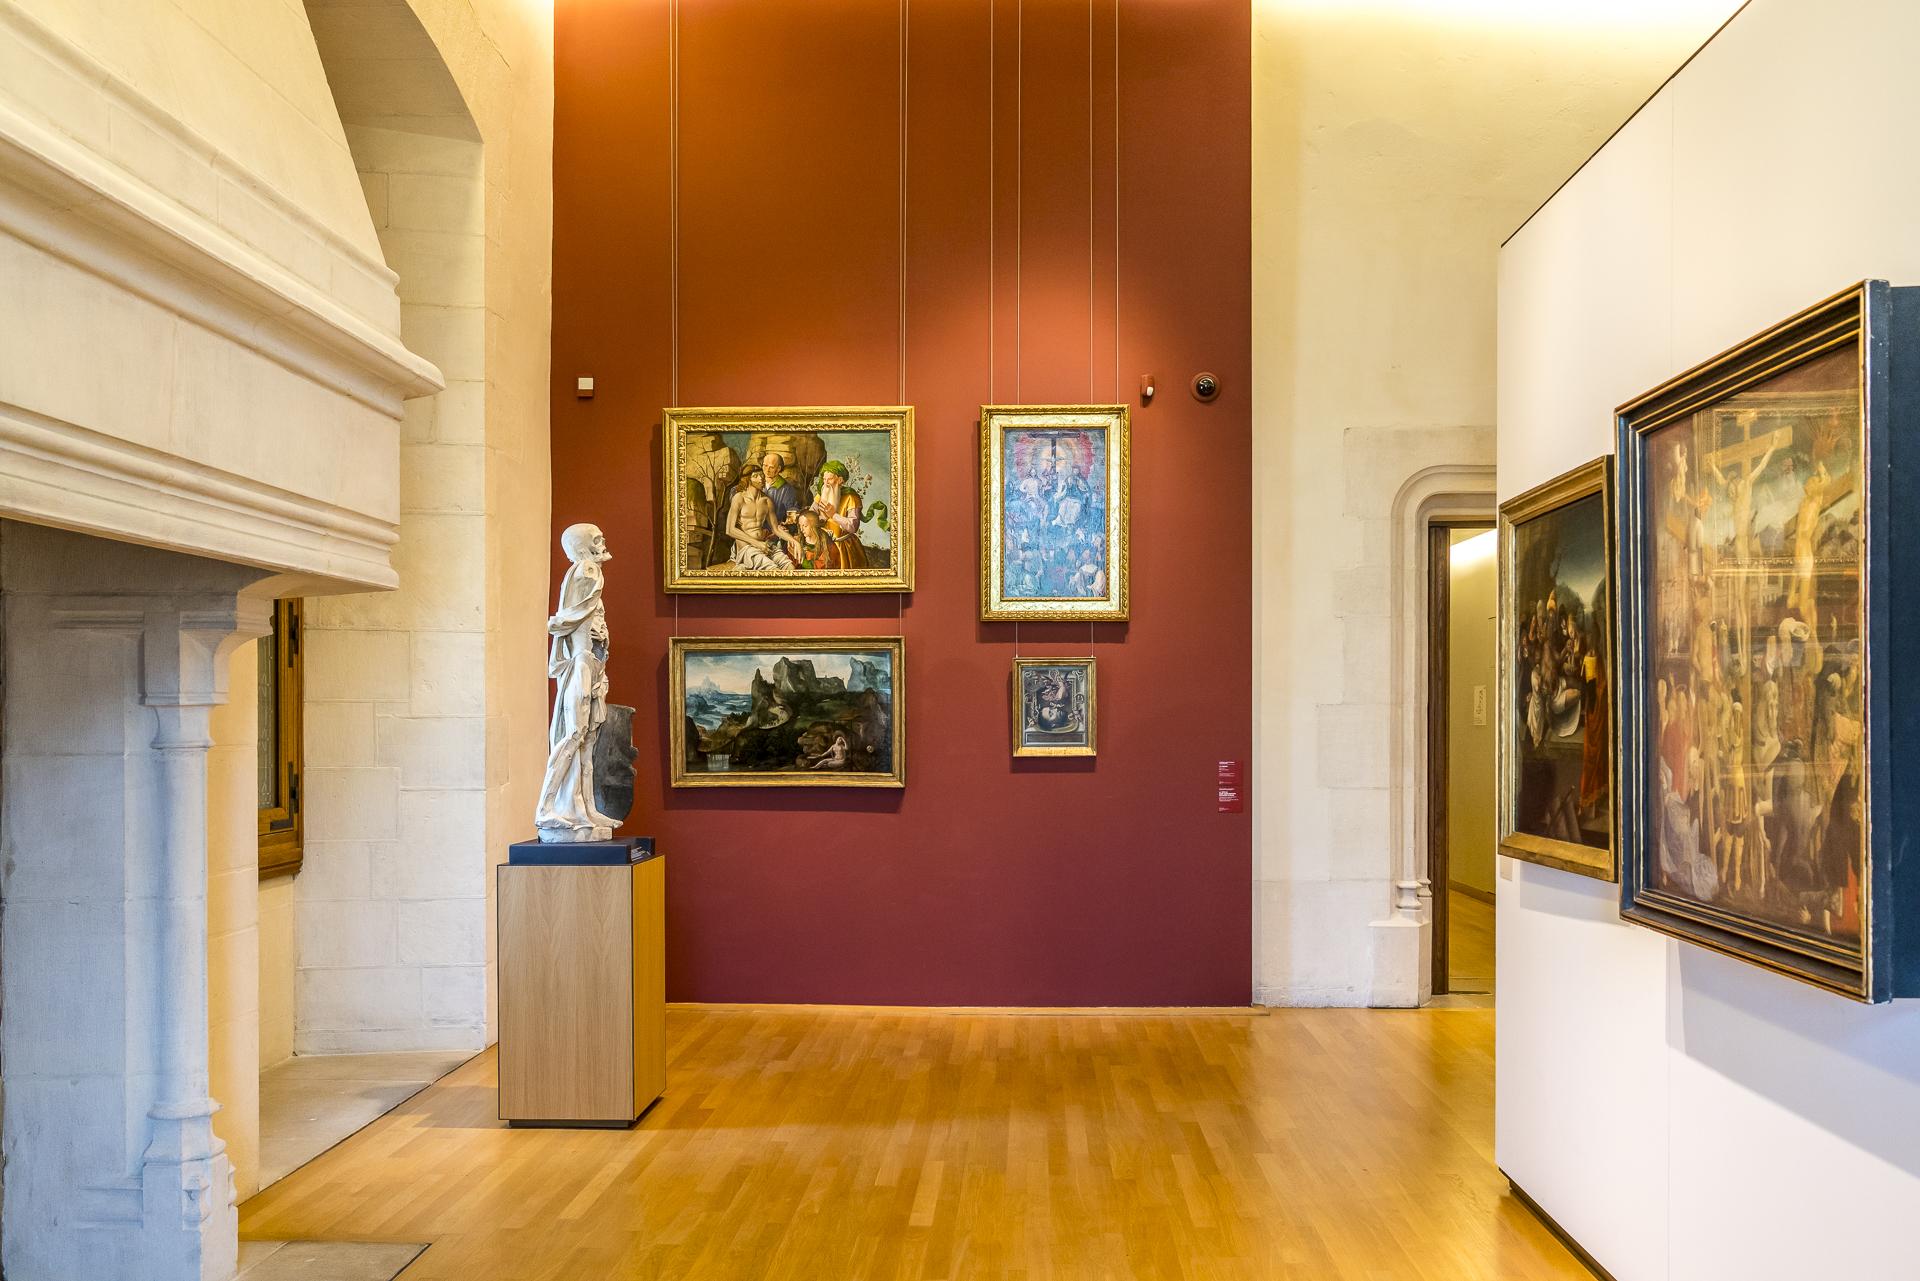 Musee des Beaux Arts Dijon